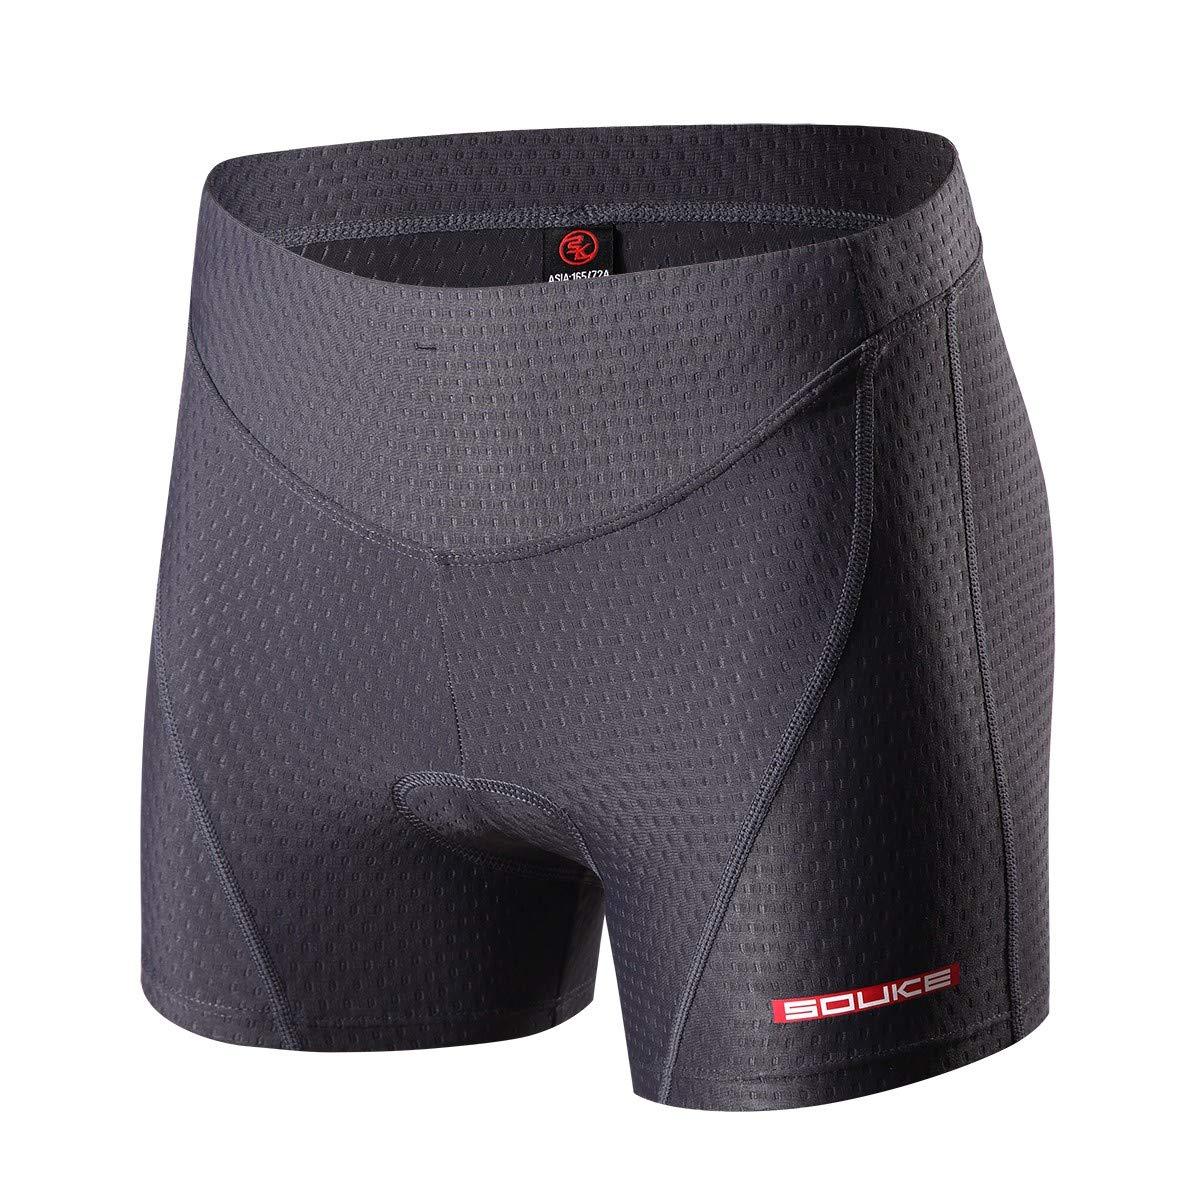 Eco-daily Cycling Shorts Women's 3D Padded Bicycle Bike Biking Underwear Shorts (Darkgrey, XXL)